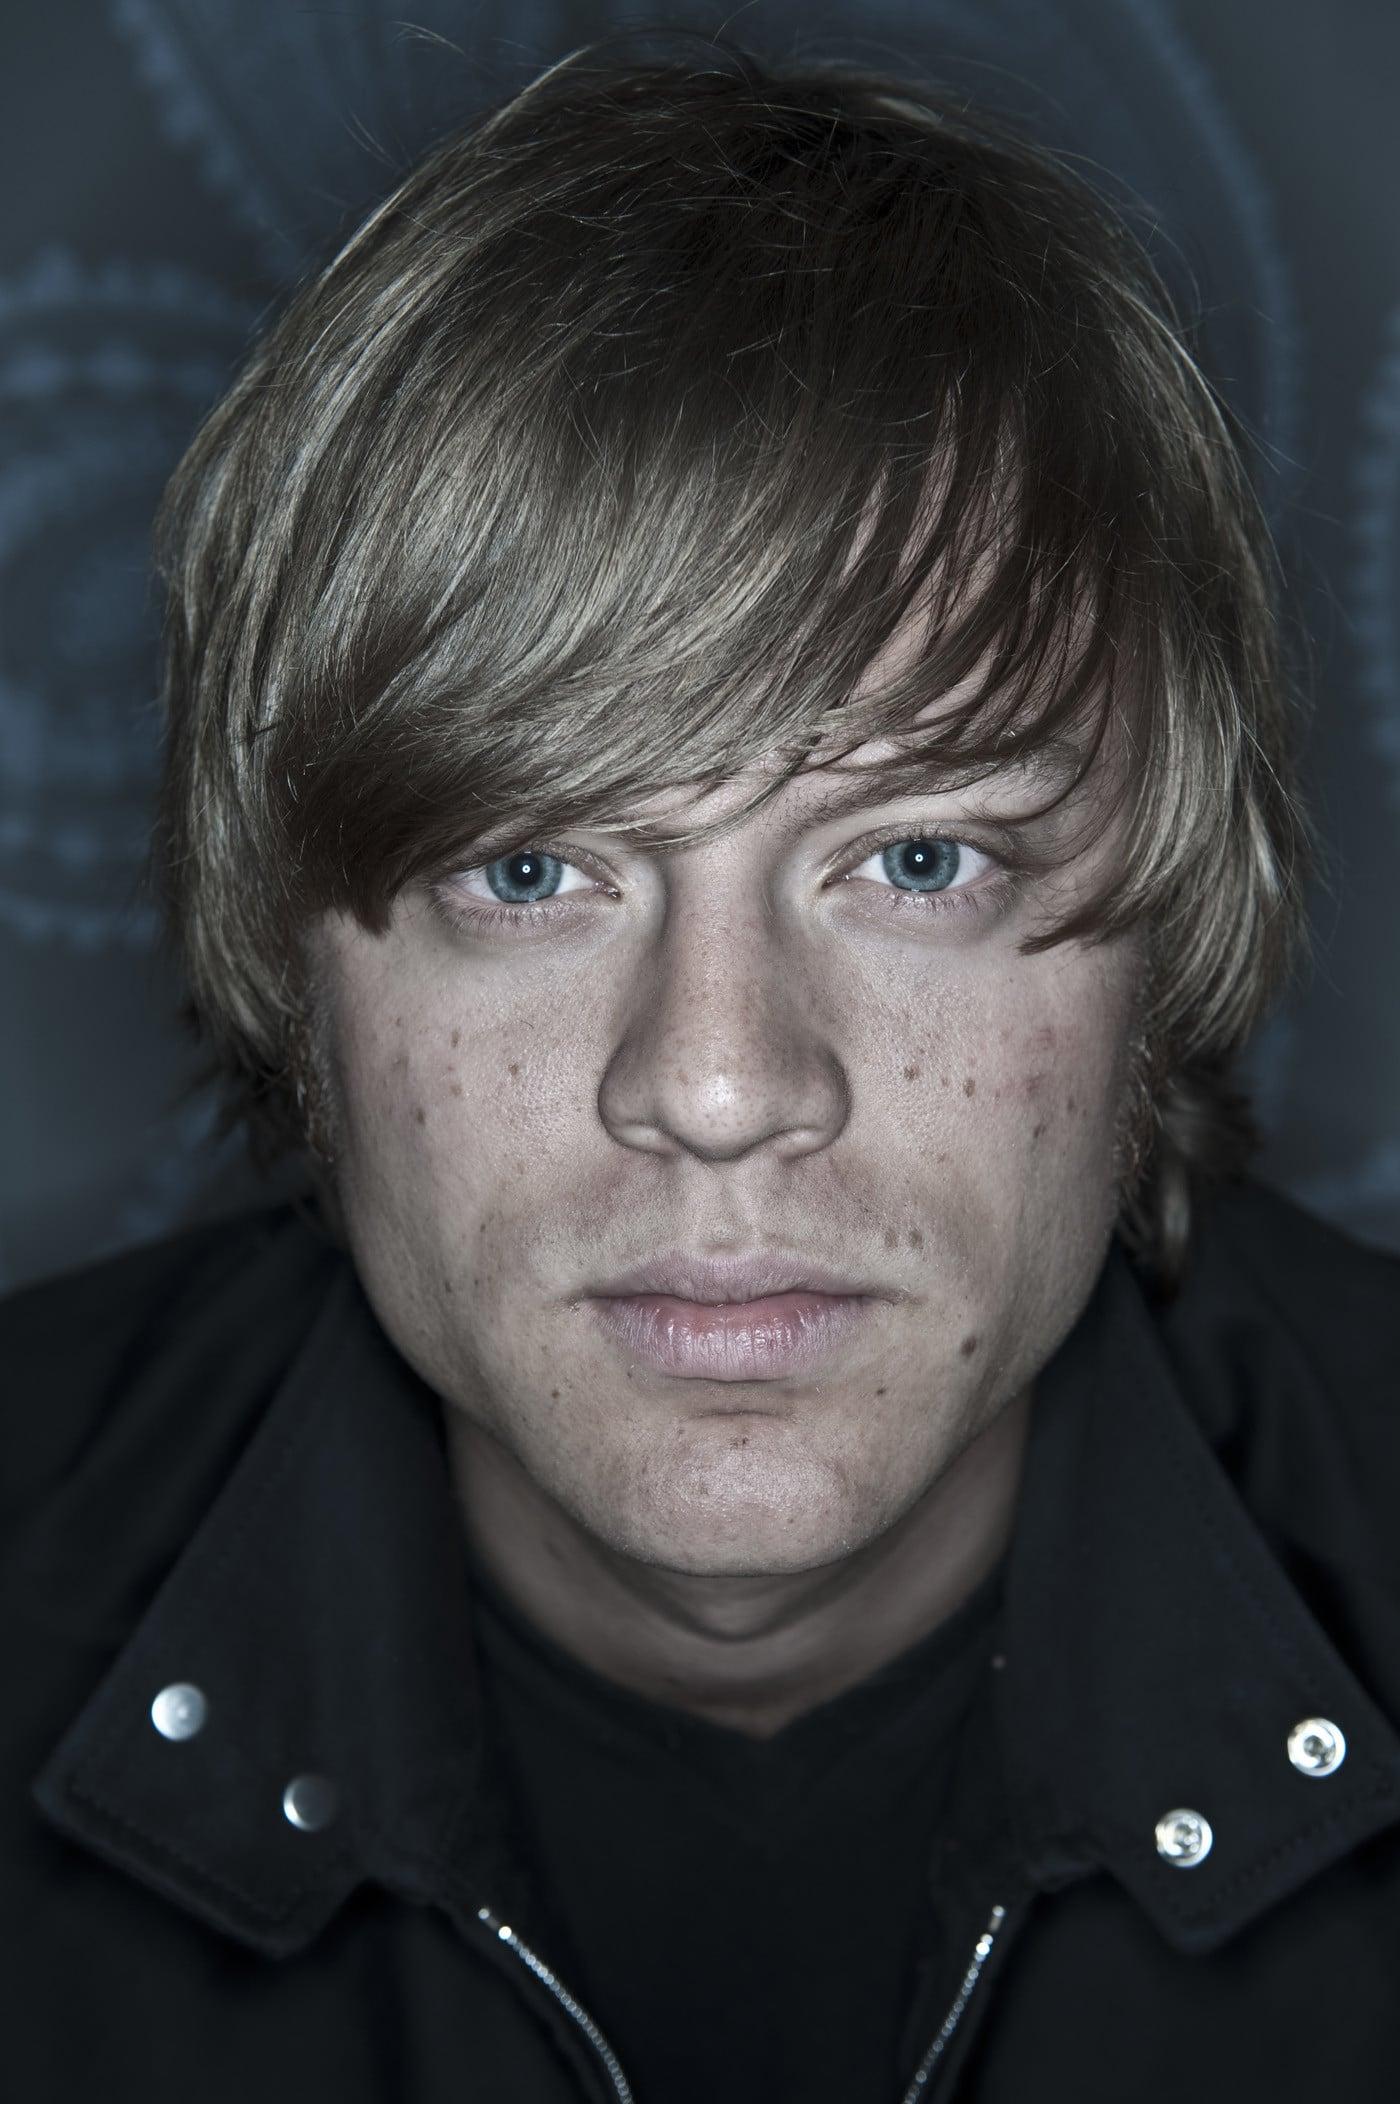 Björn Dixgård, Mando Diao